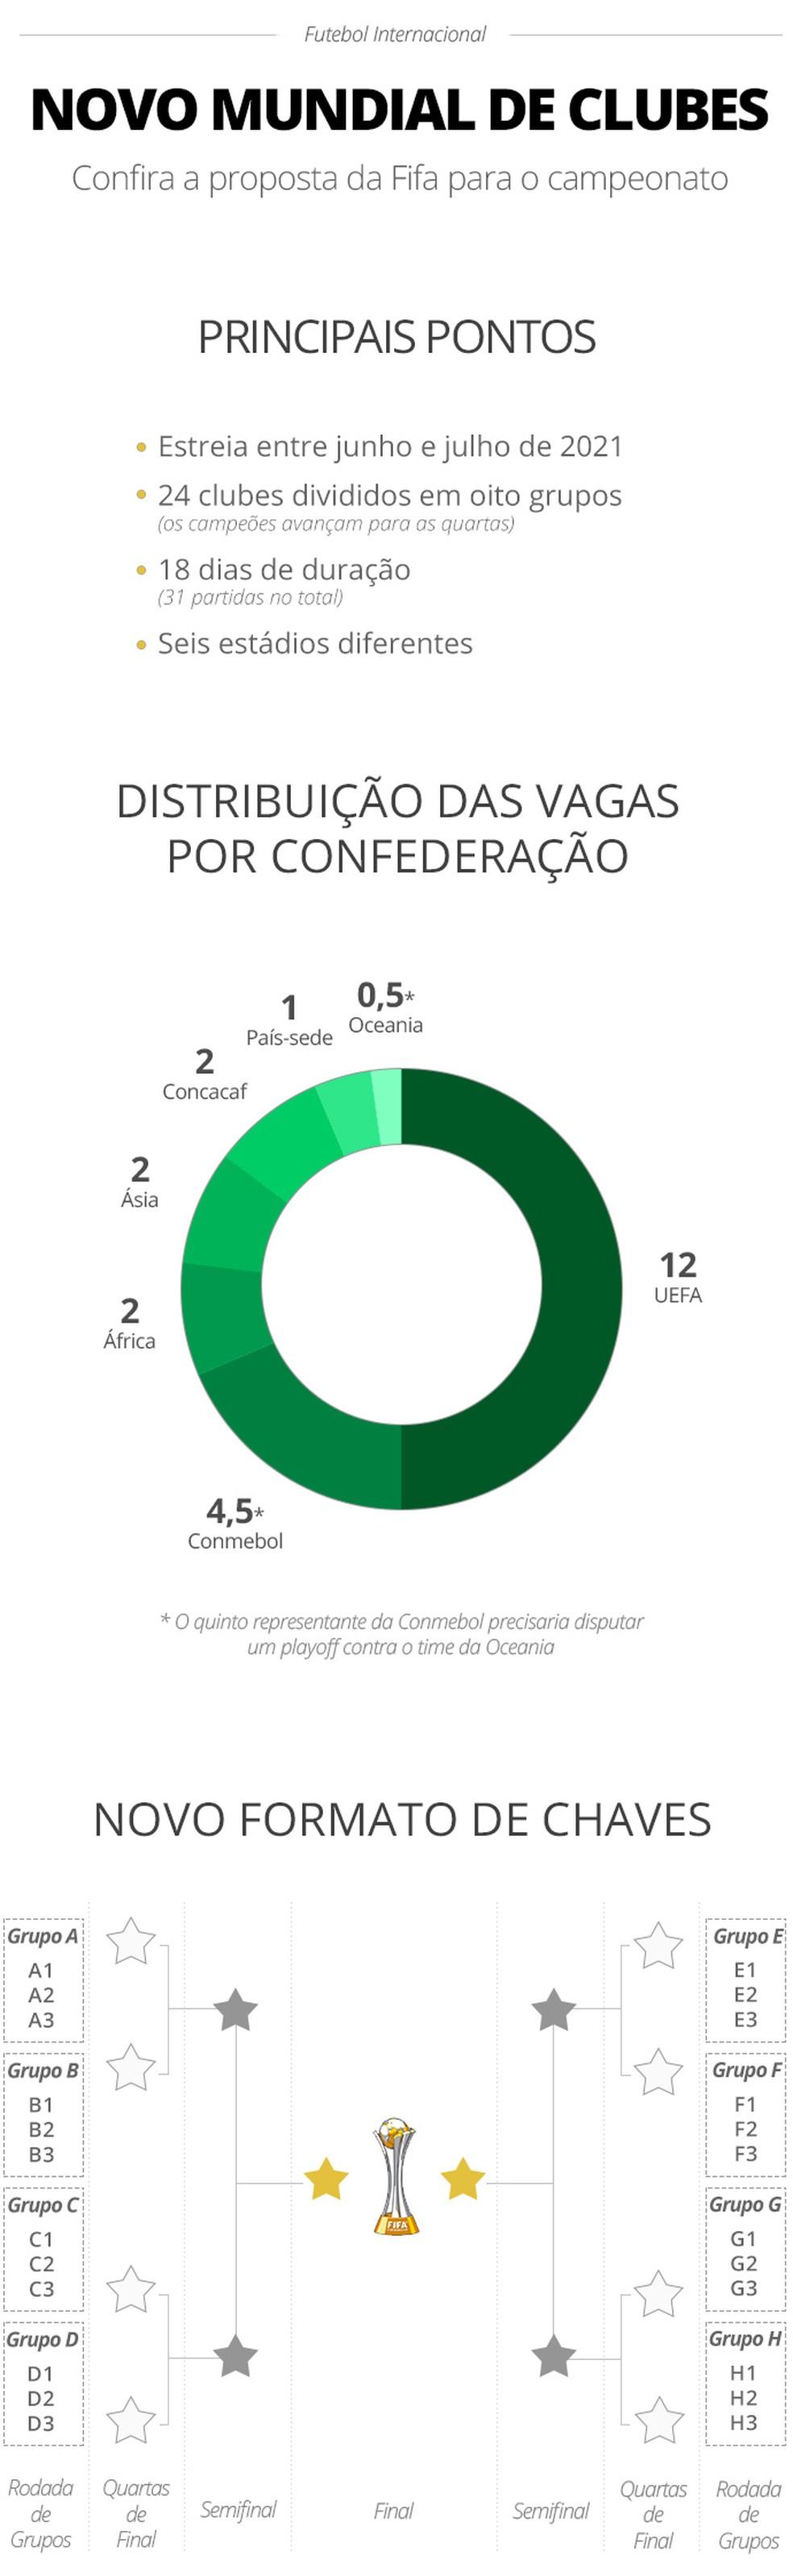 Info Mundial de Clubes (Foto: infoesporte)